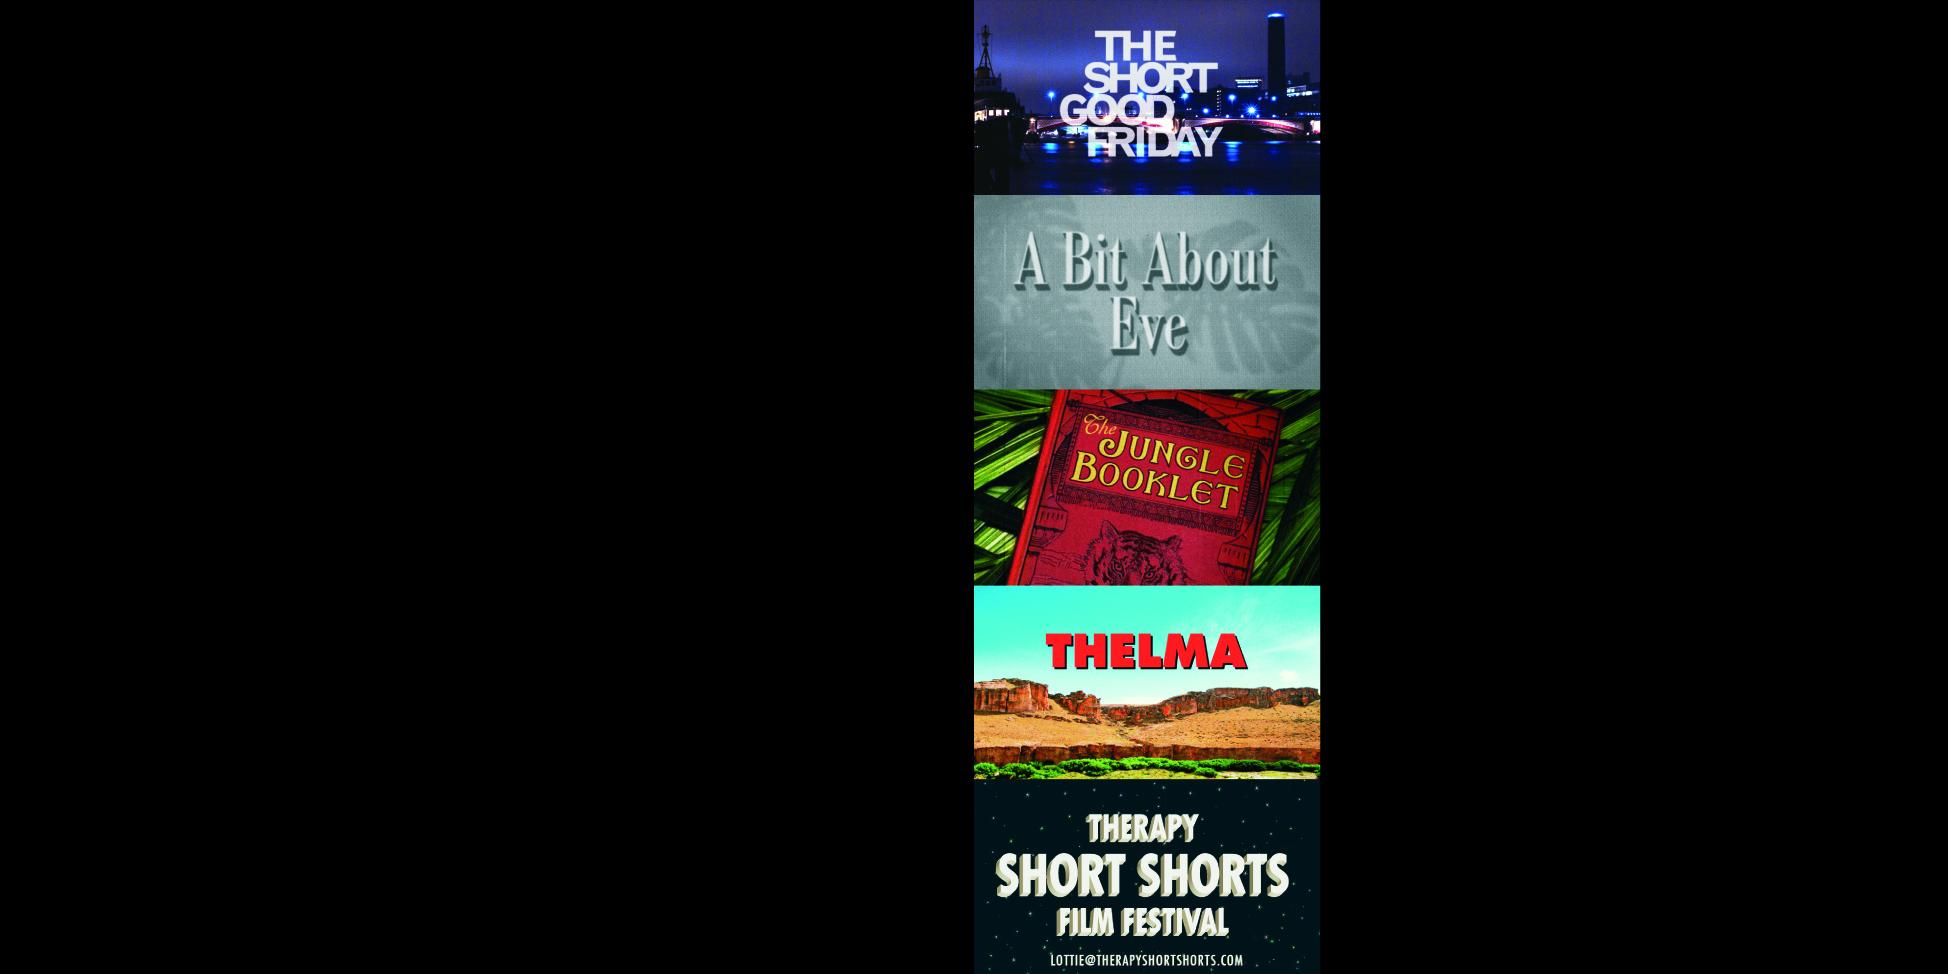 'The Short Good' Therapy Short Film, (Black), DHM.jpg